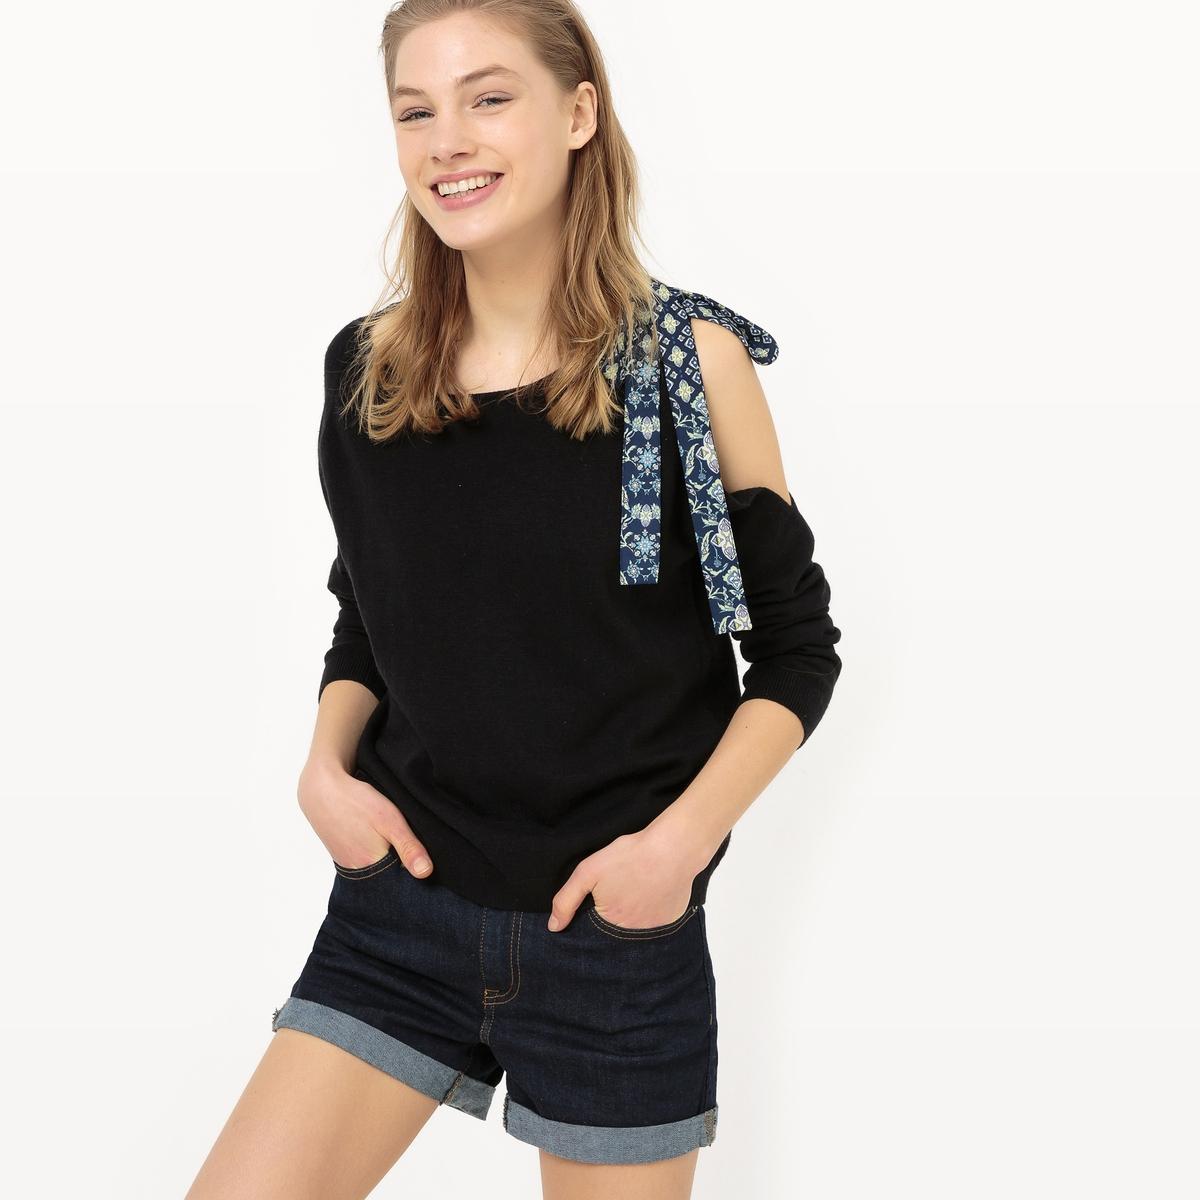 Пуловер с вырезом-лодочкой и застежкой на плече пуловер vero moda vero moda ve389ewujz90 page 1